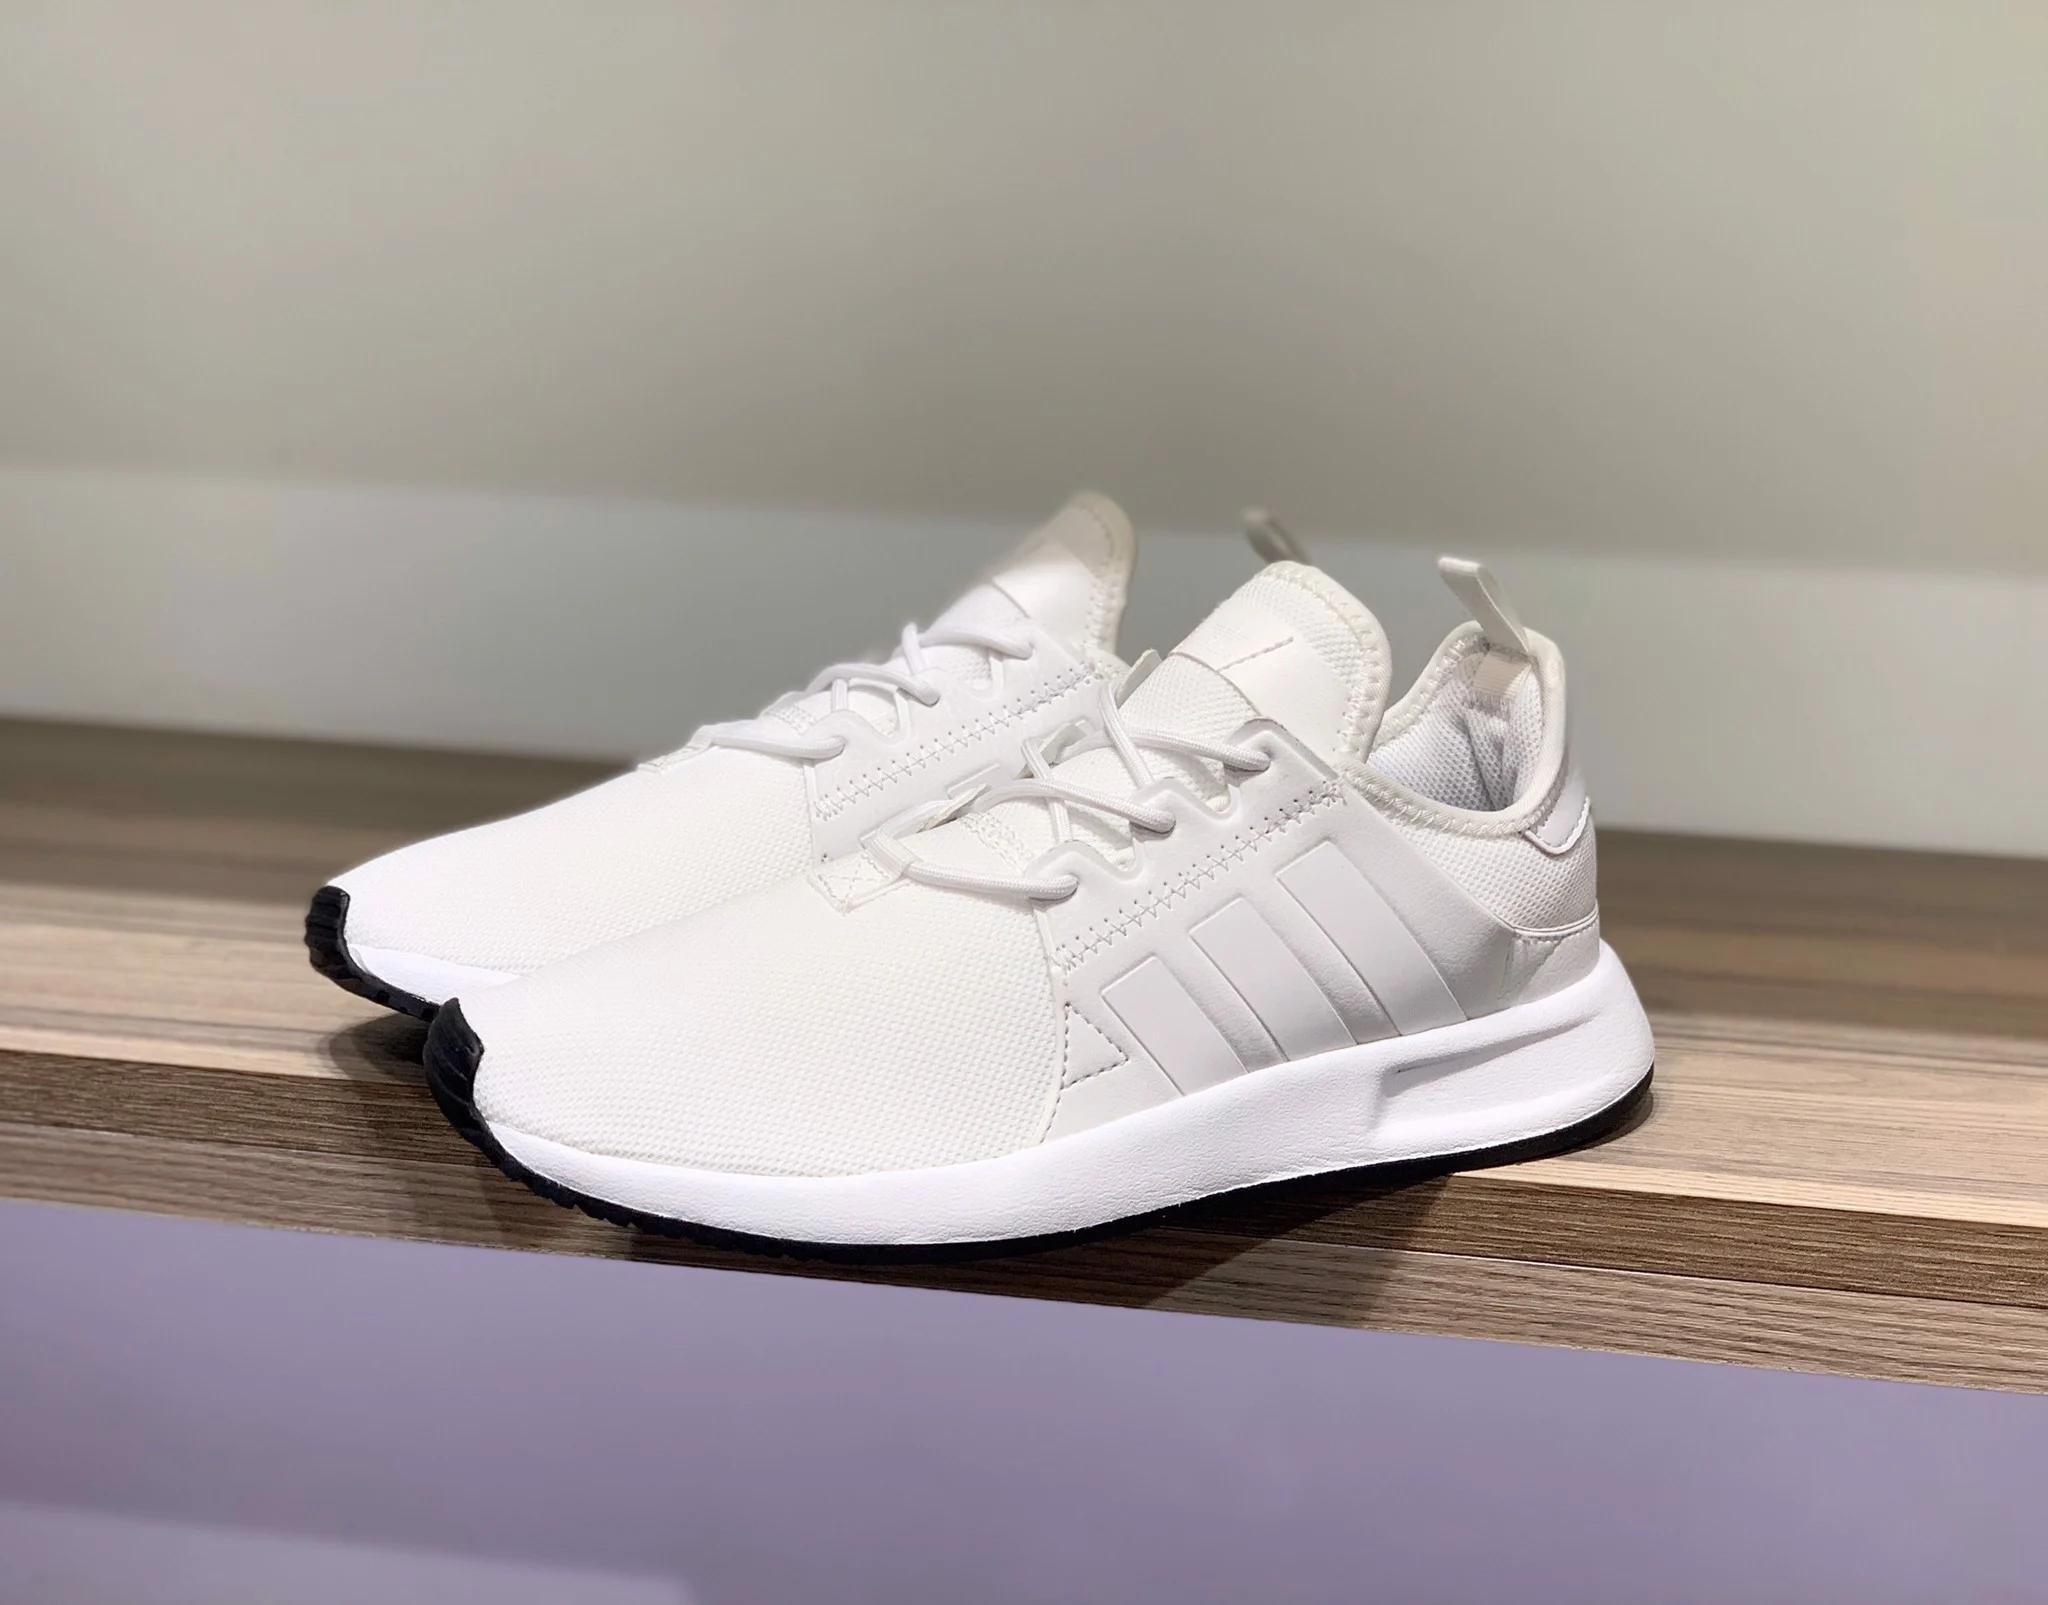 Giày Adidas nam giá rẻ TpHCM